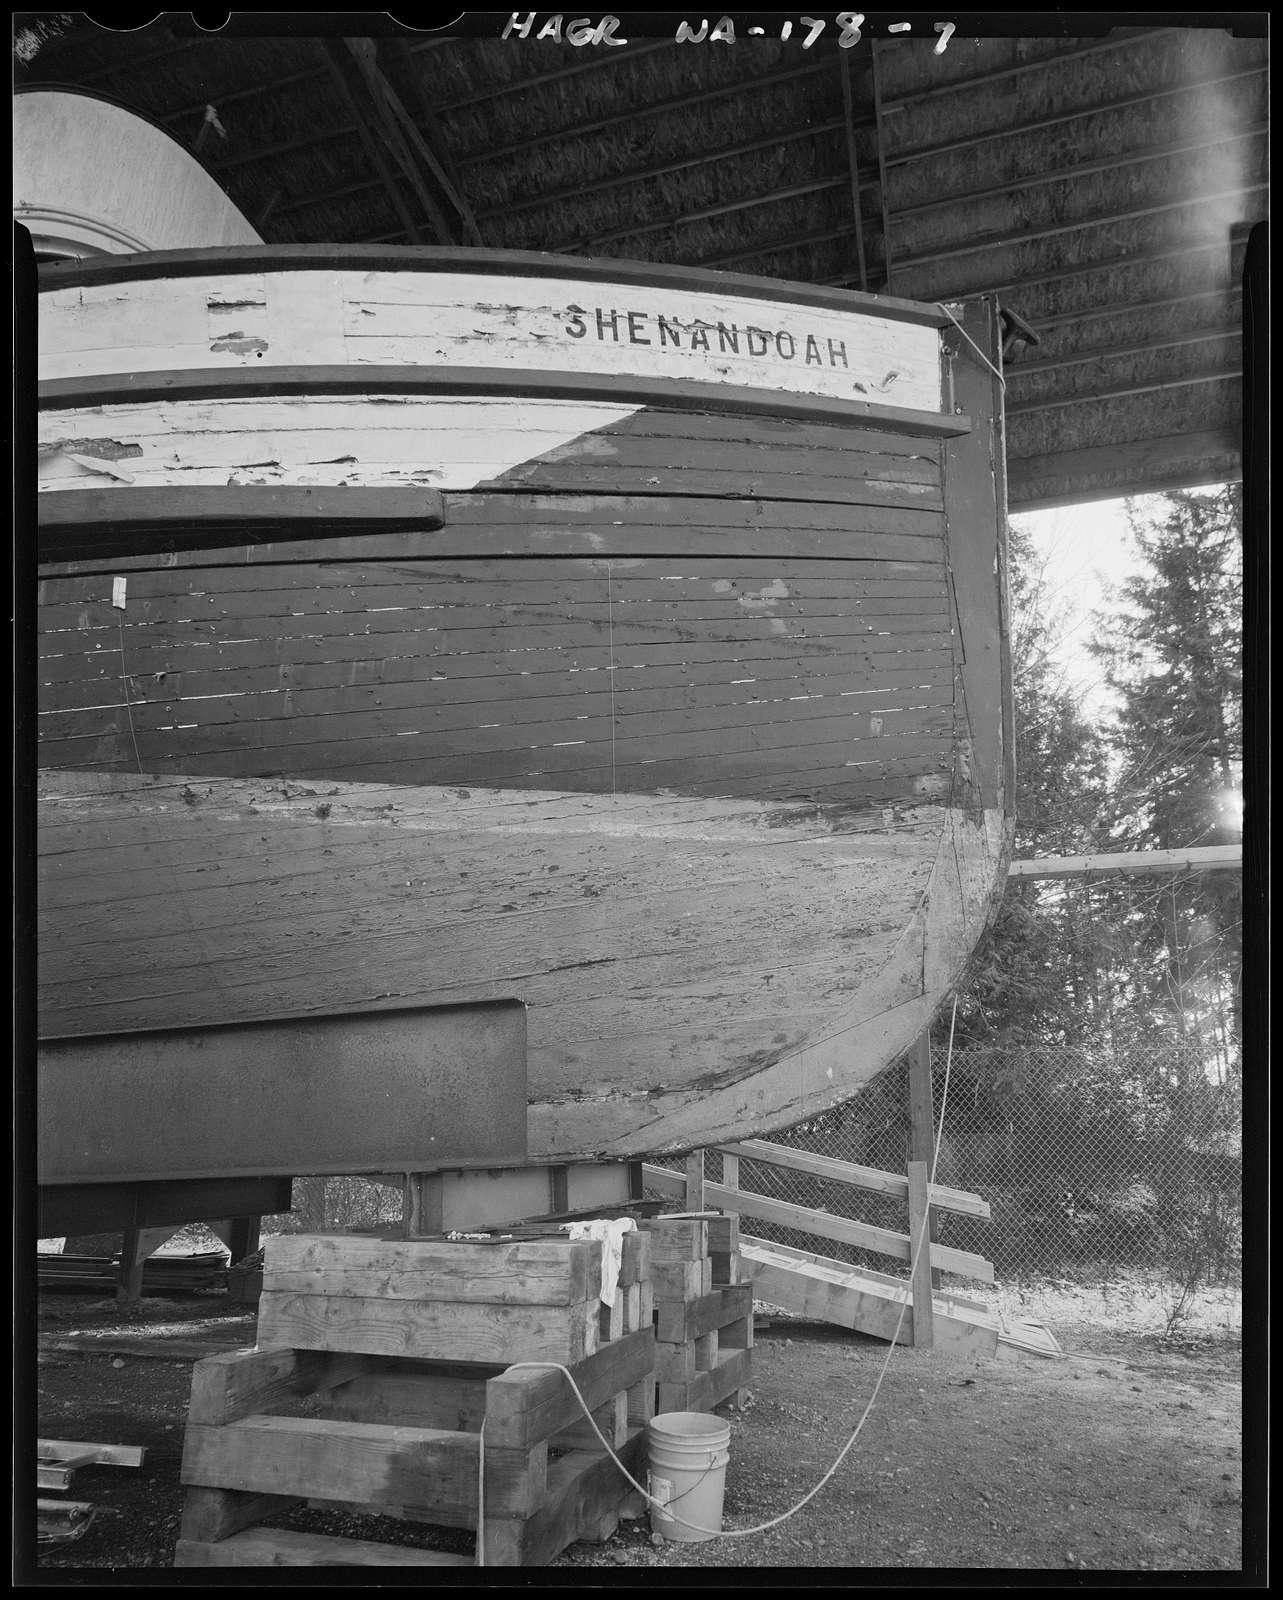 Purse Seiner SHENANDOAH, Gig Harbor Peninsula Historical Society and Museum, Gig Harbor, Pierce County, WA